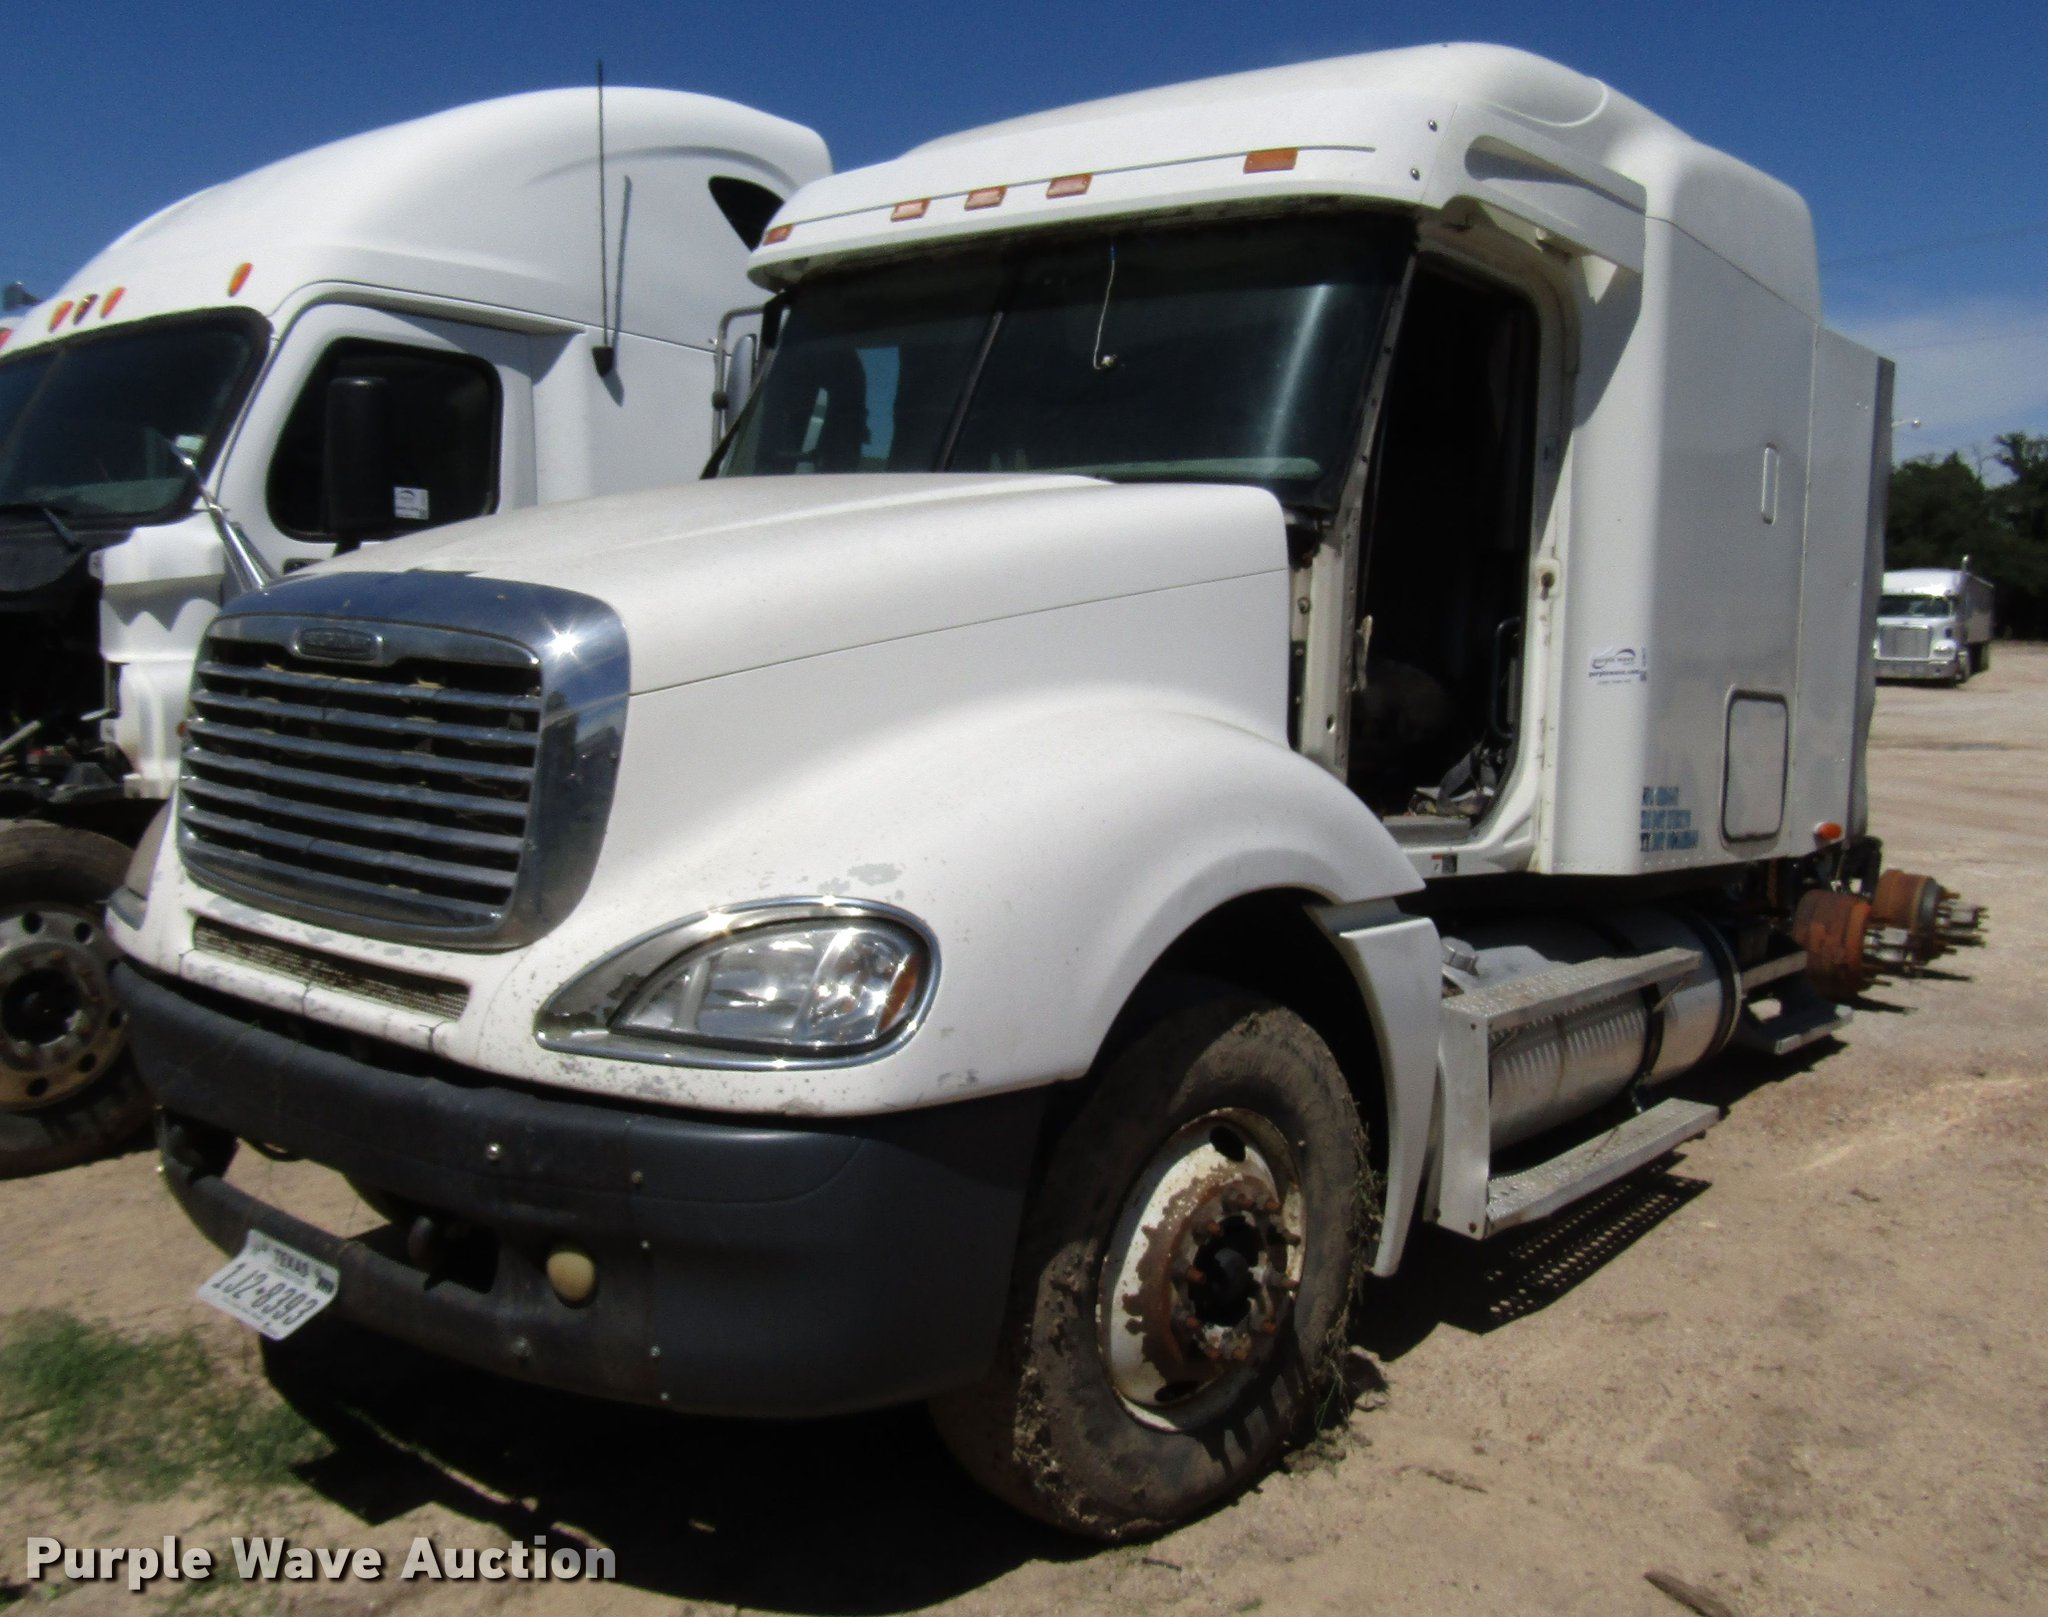 2004 Freightliner Columbia semi truck | Item DF8072 | Thursd